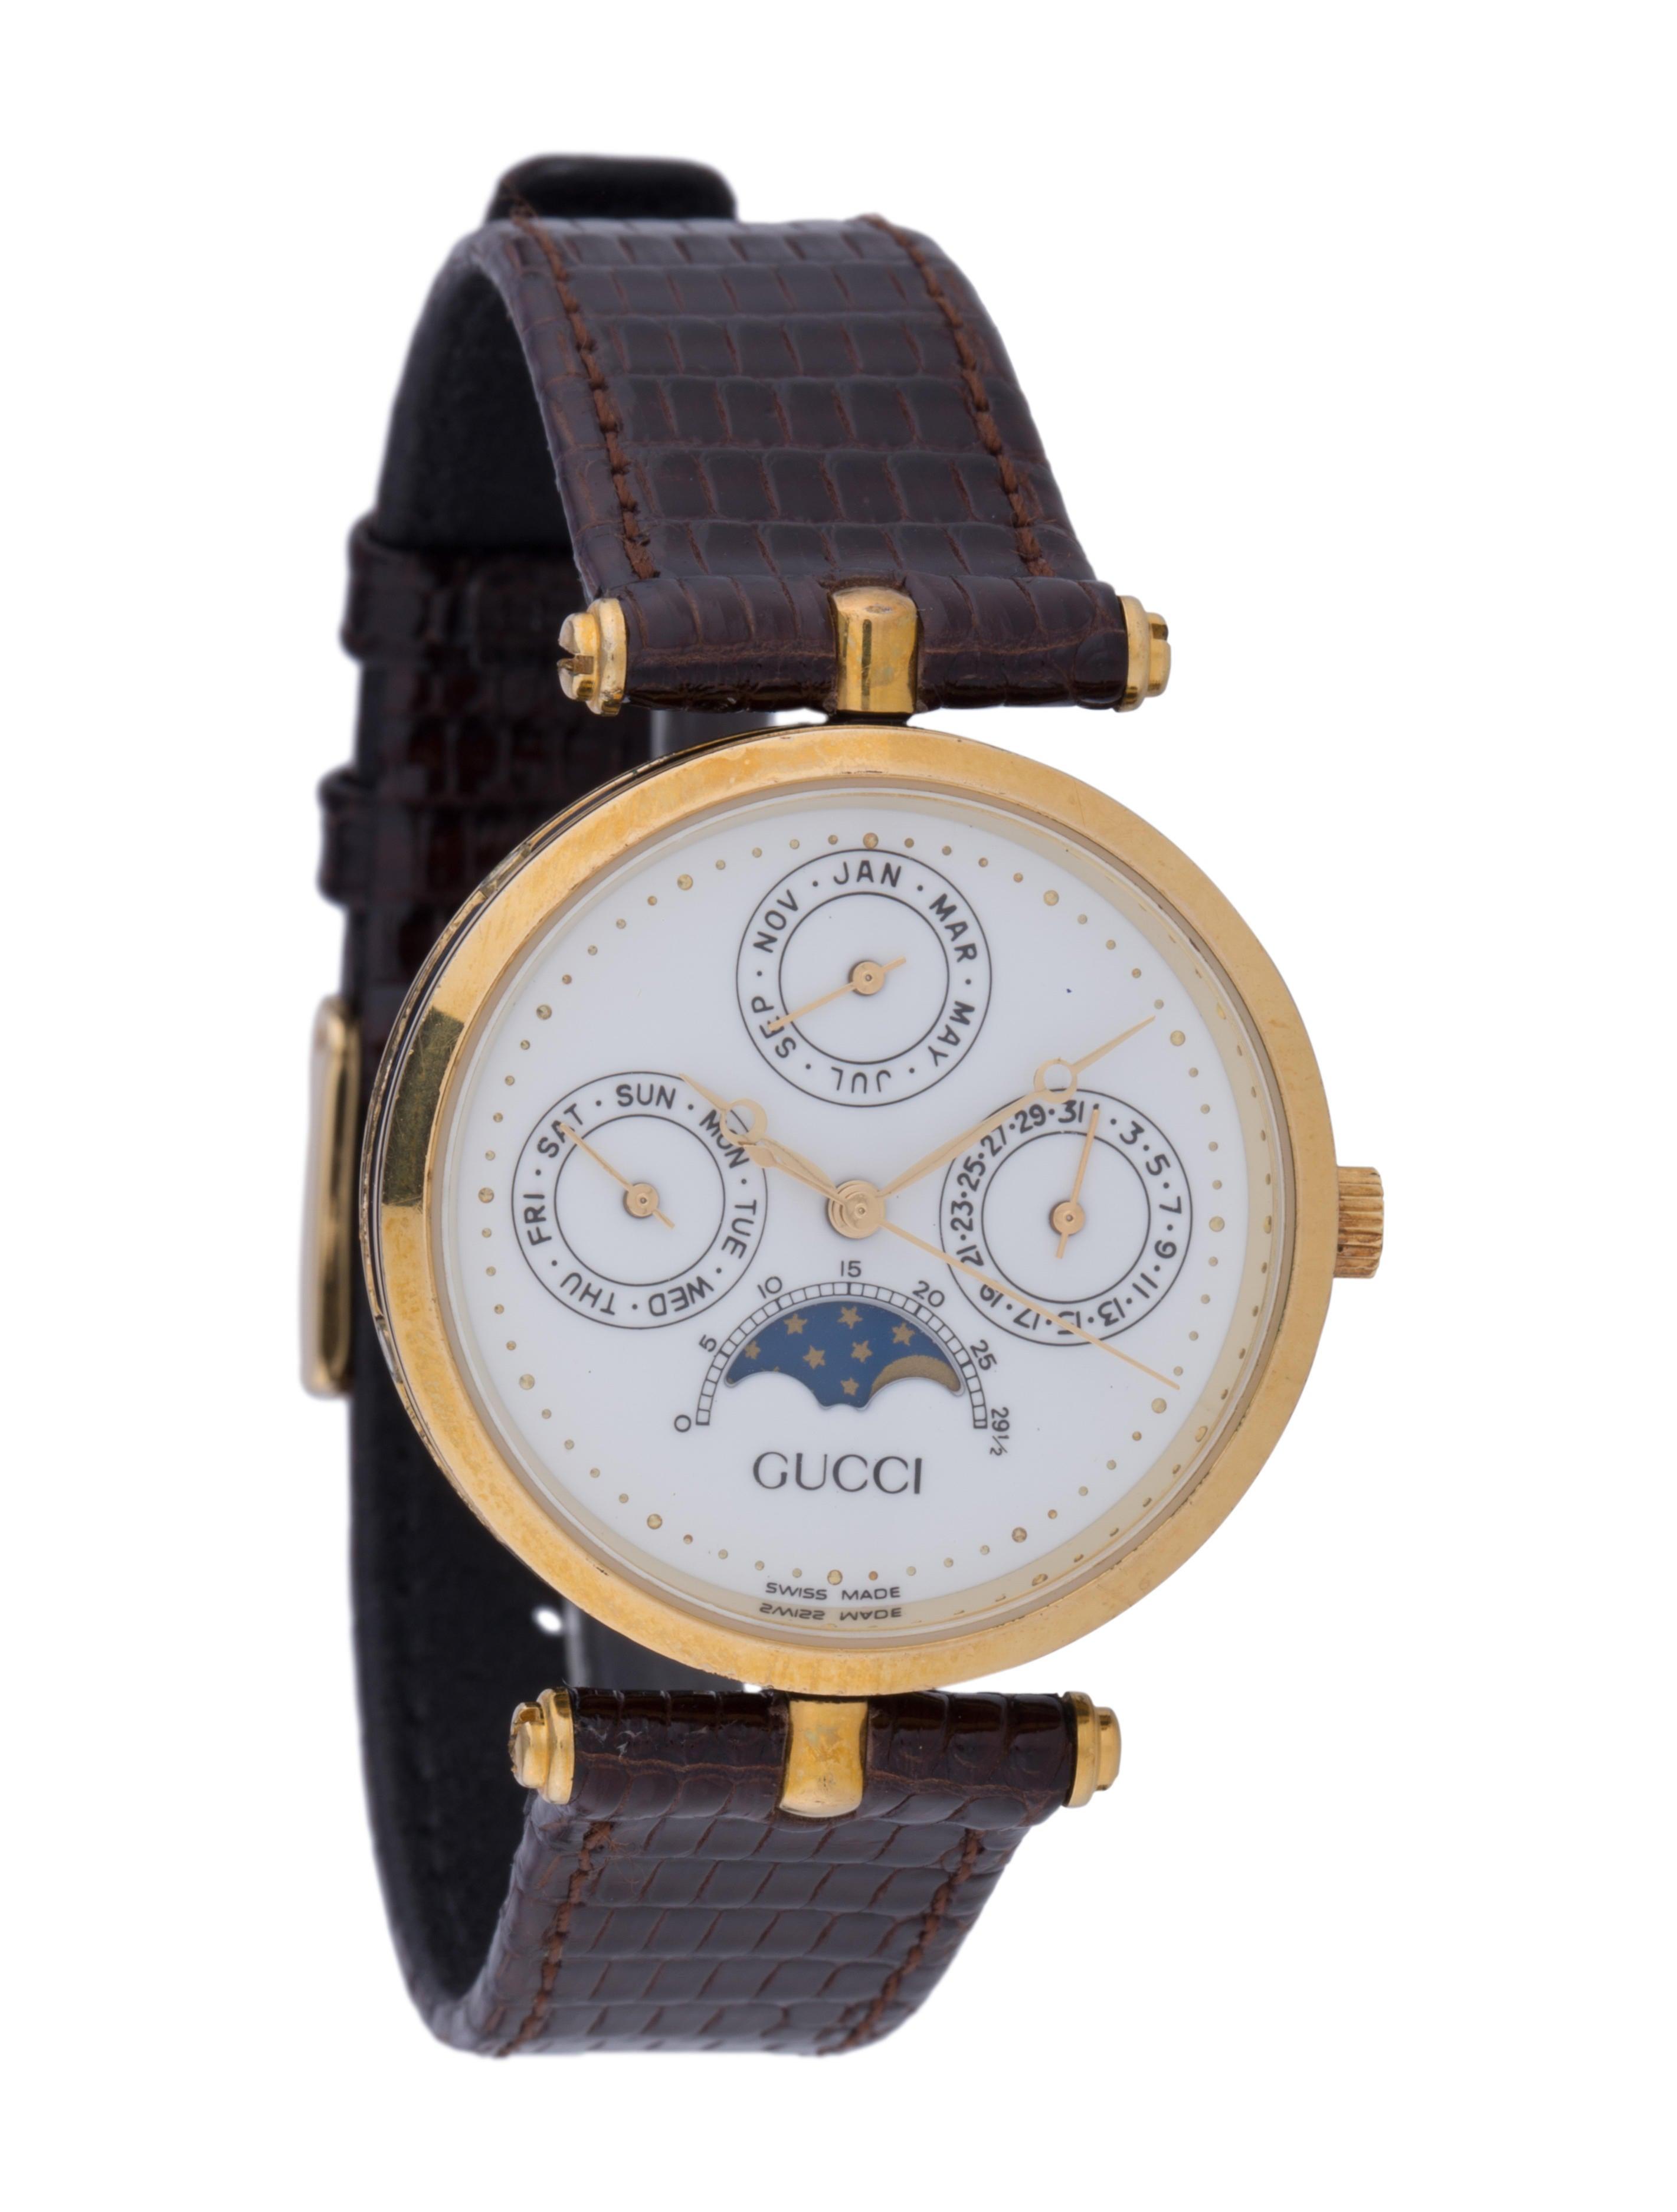 4191cb2aa7f Gucci Moon Phase Watch - Strap - GUC96499